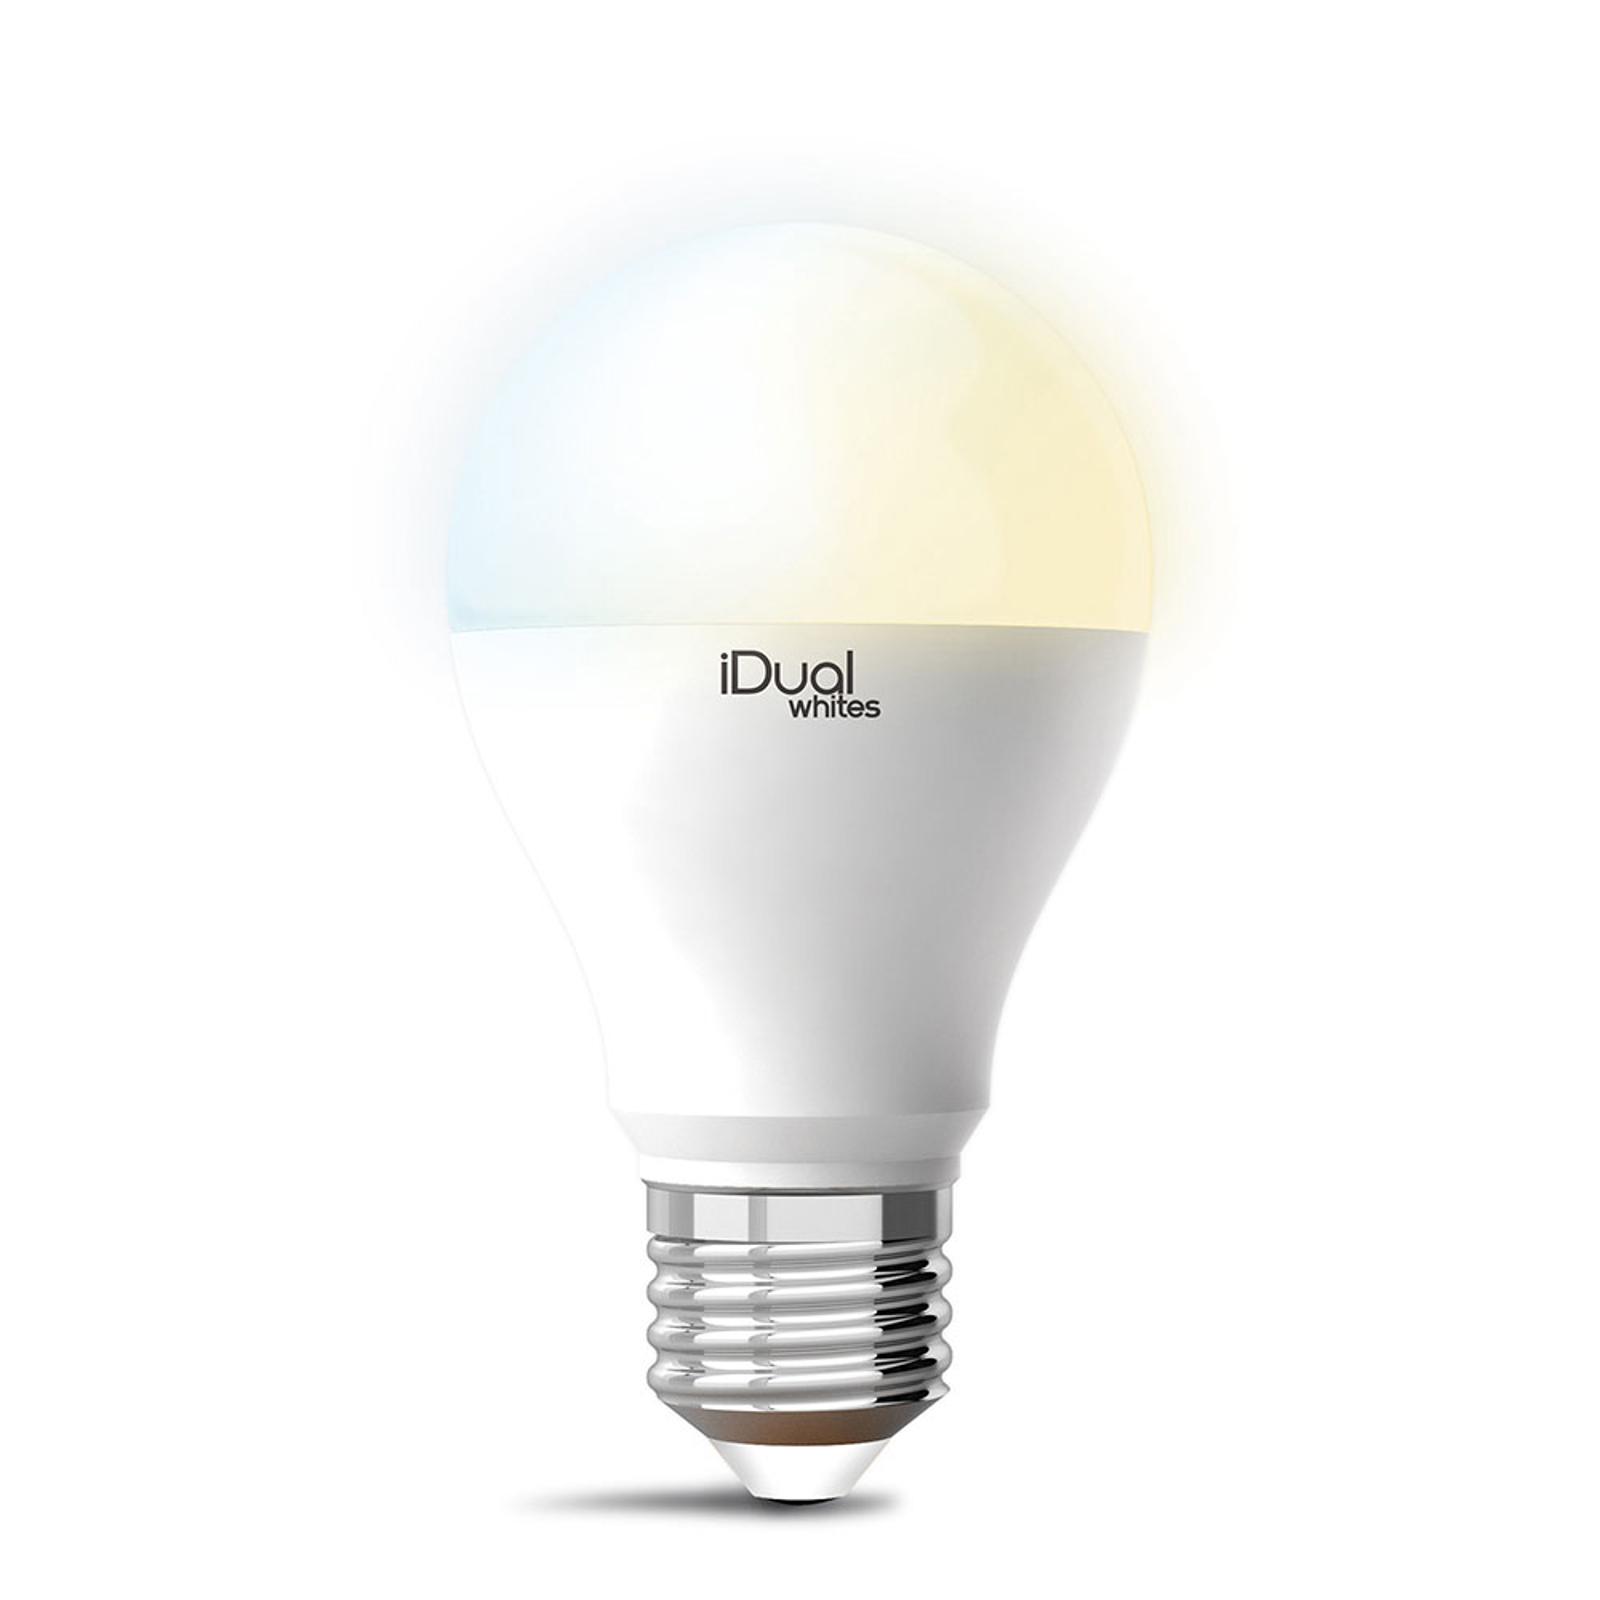 iDual Whites LED-Lampe E27 A60 10W tunable white